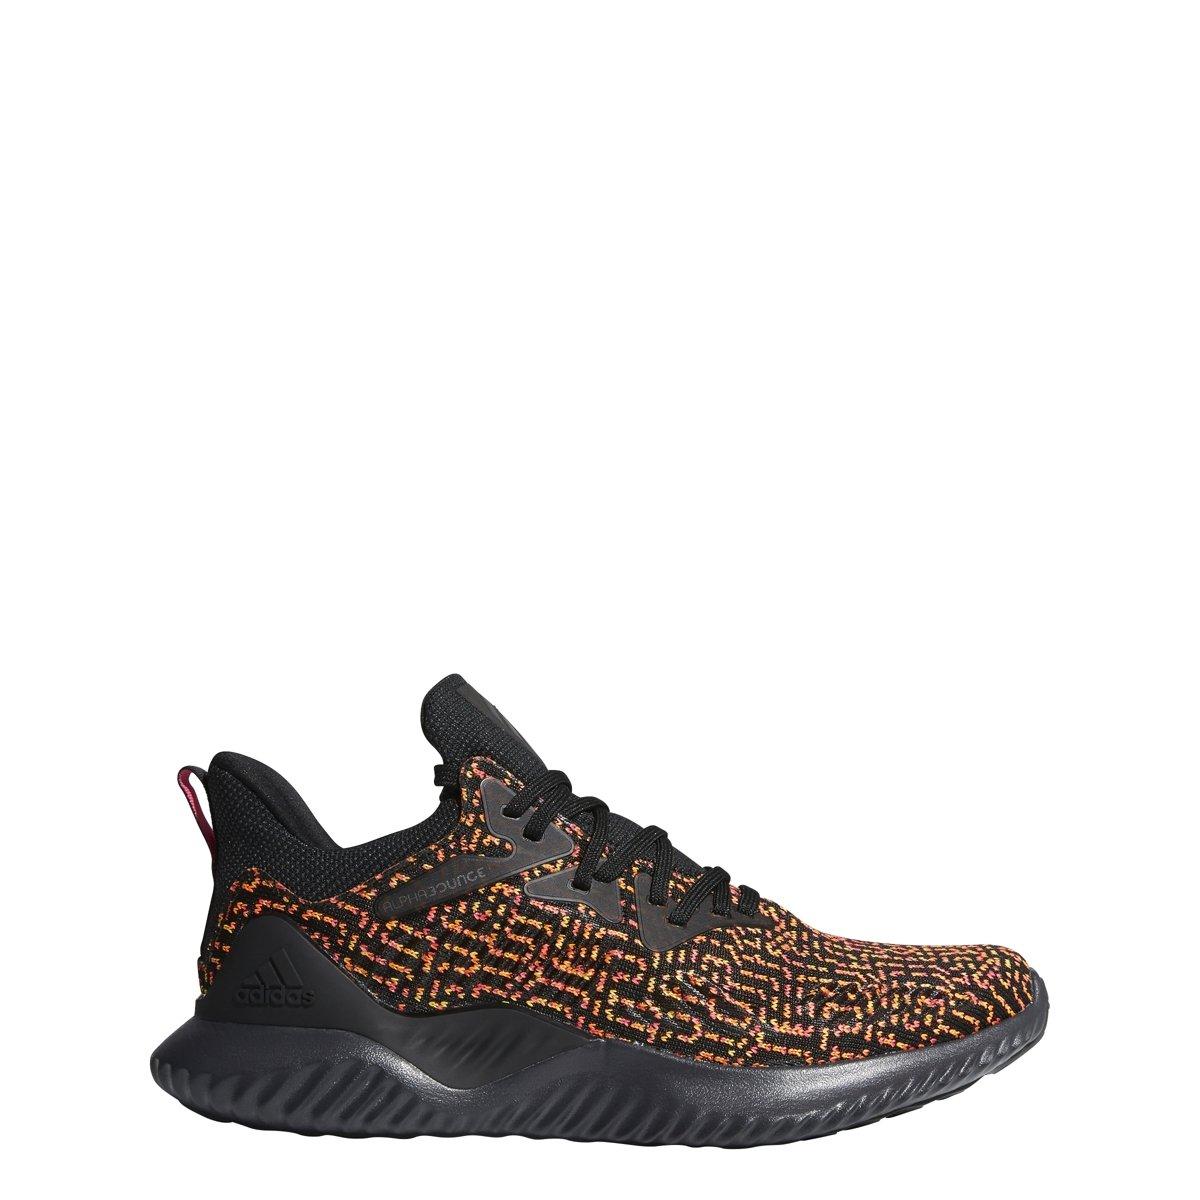 adidas Men's Alphabounce Beyond Ck Running Shoe B077XHXJ6J 14 M US|Black/Carbon/Shock Pink